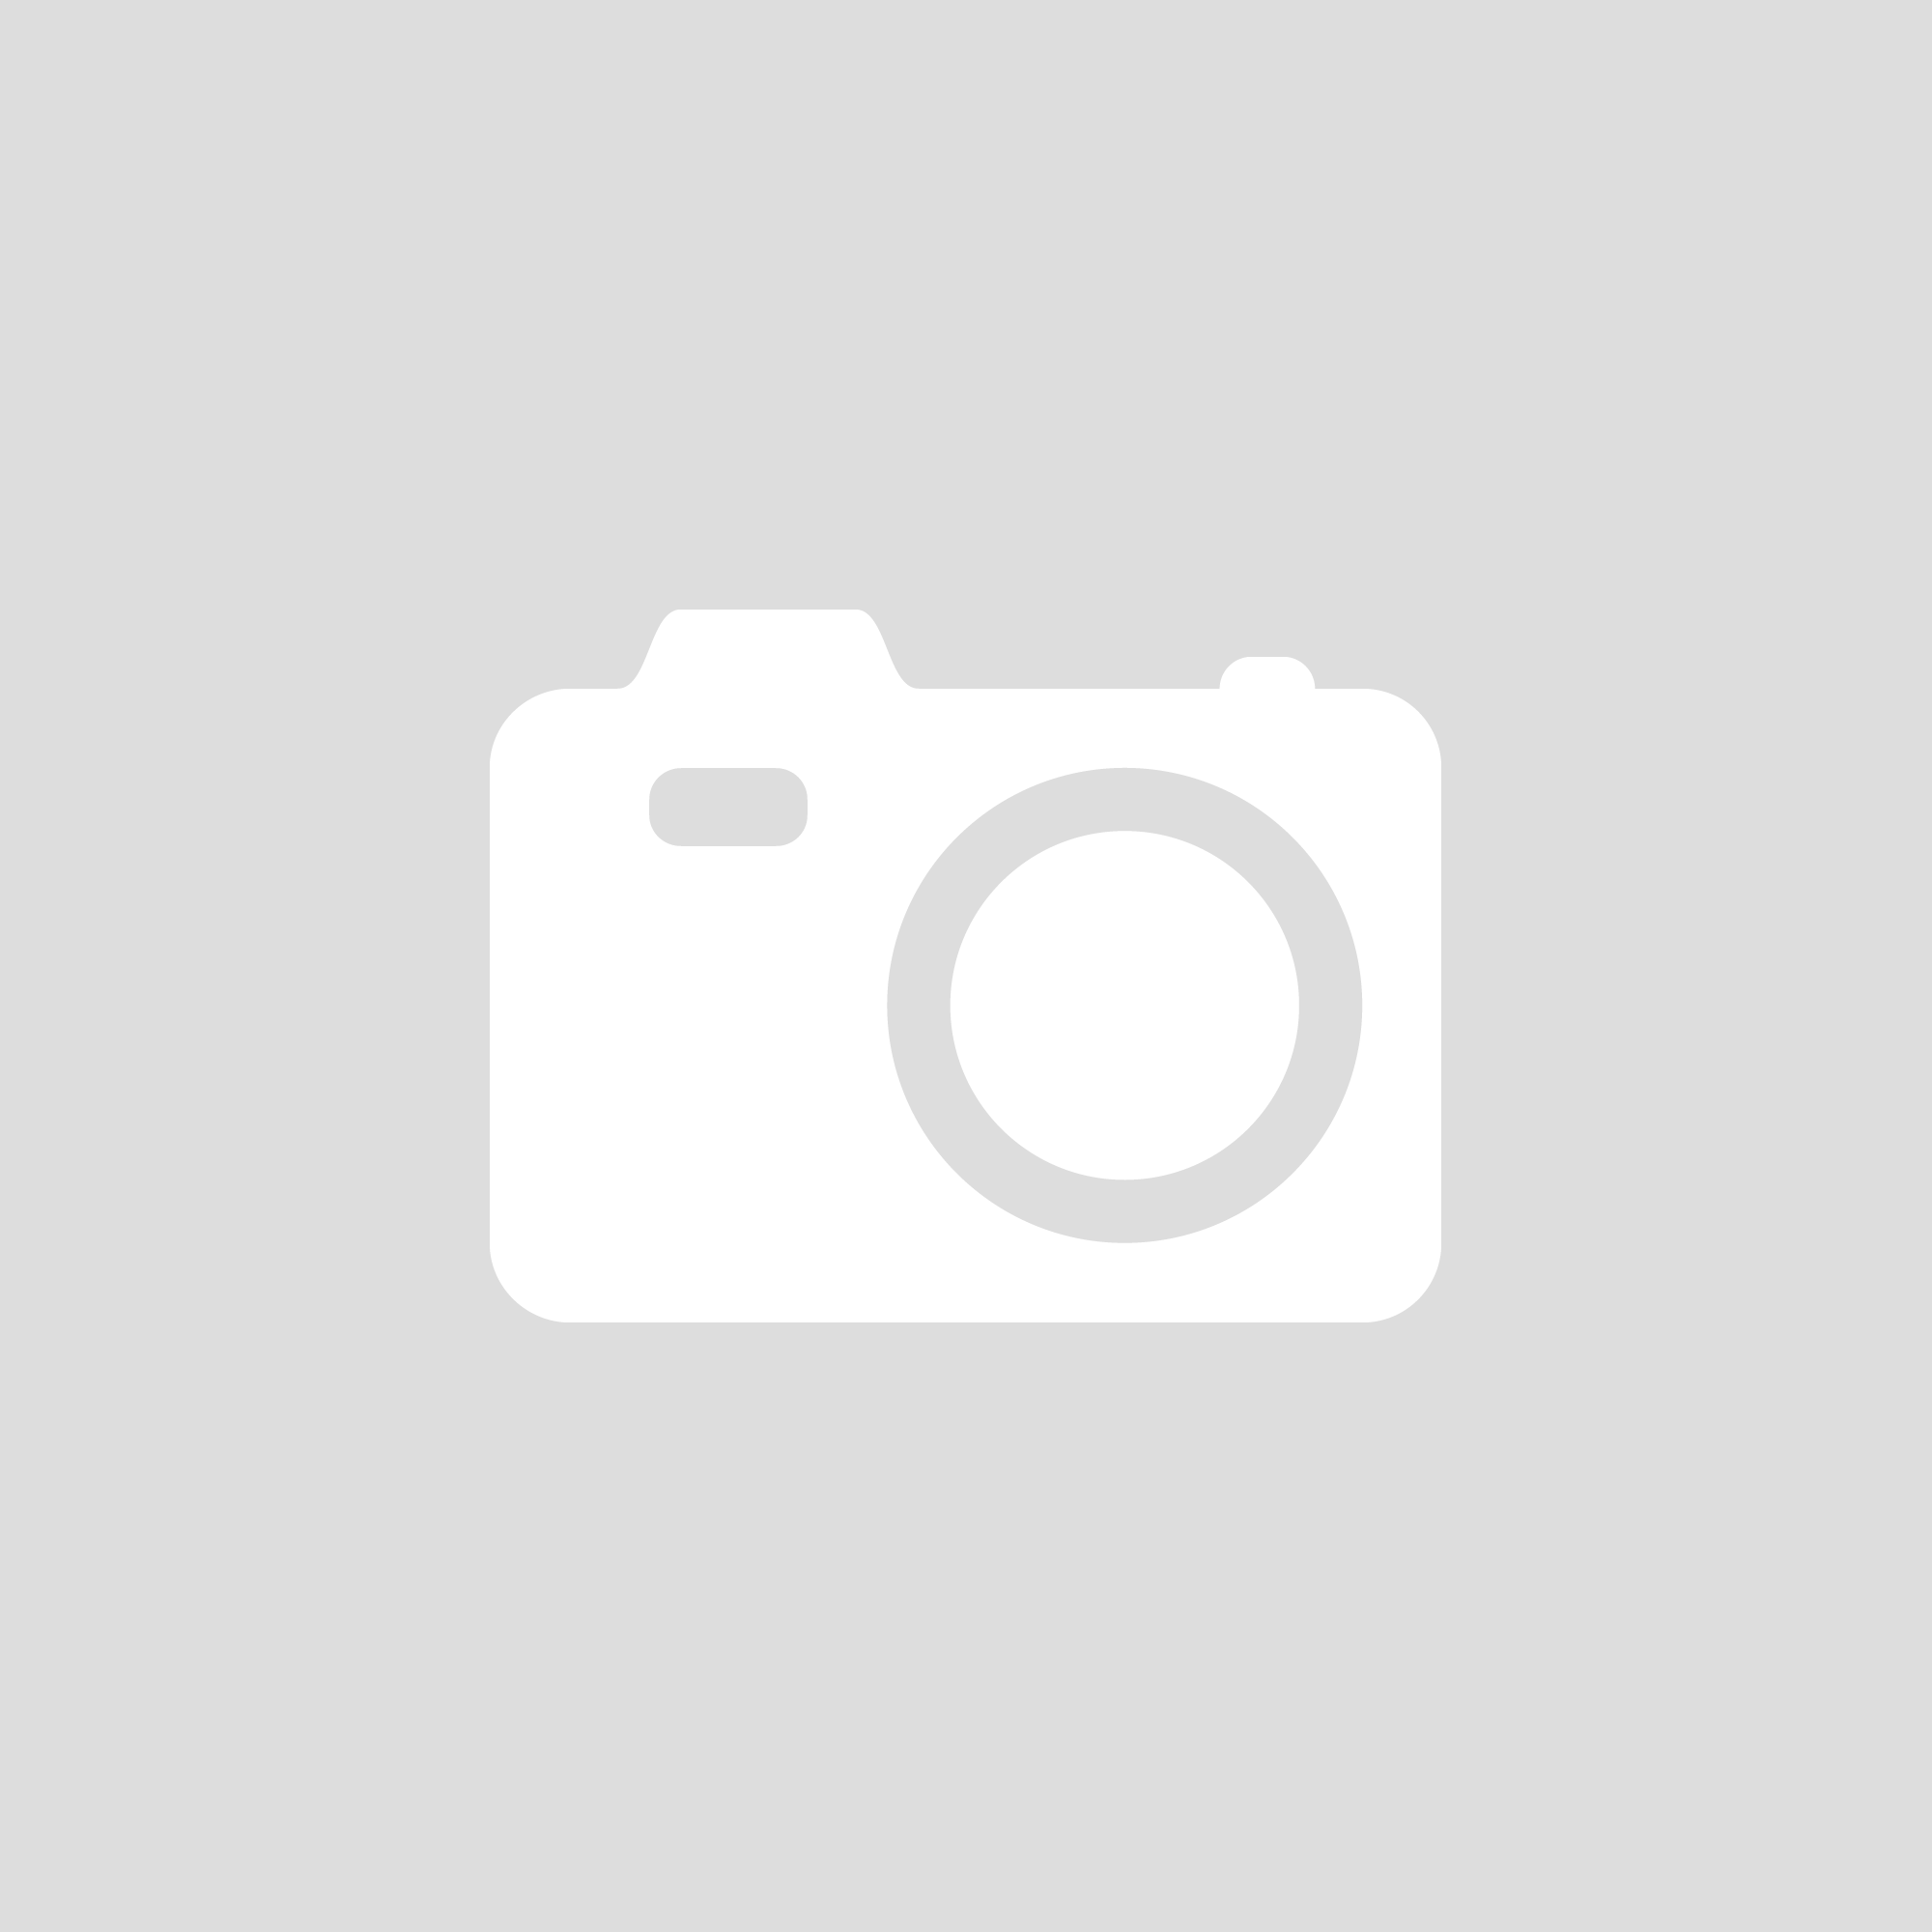 Sellaro Clear Acrylic Pendant by Lightmode LMB013